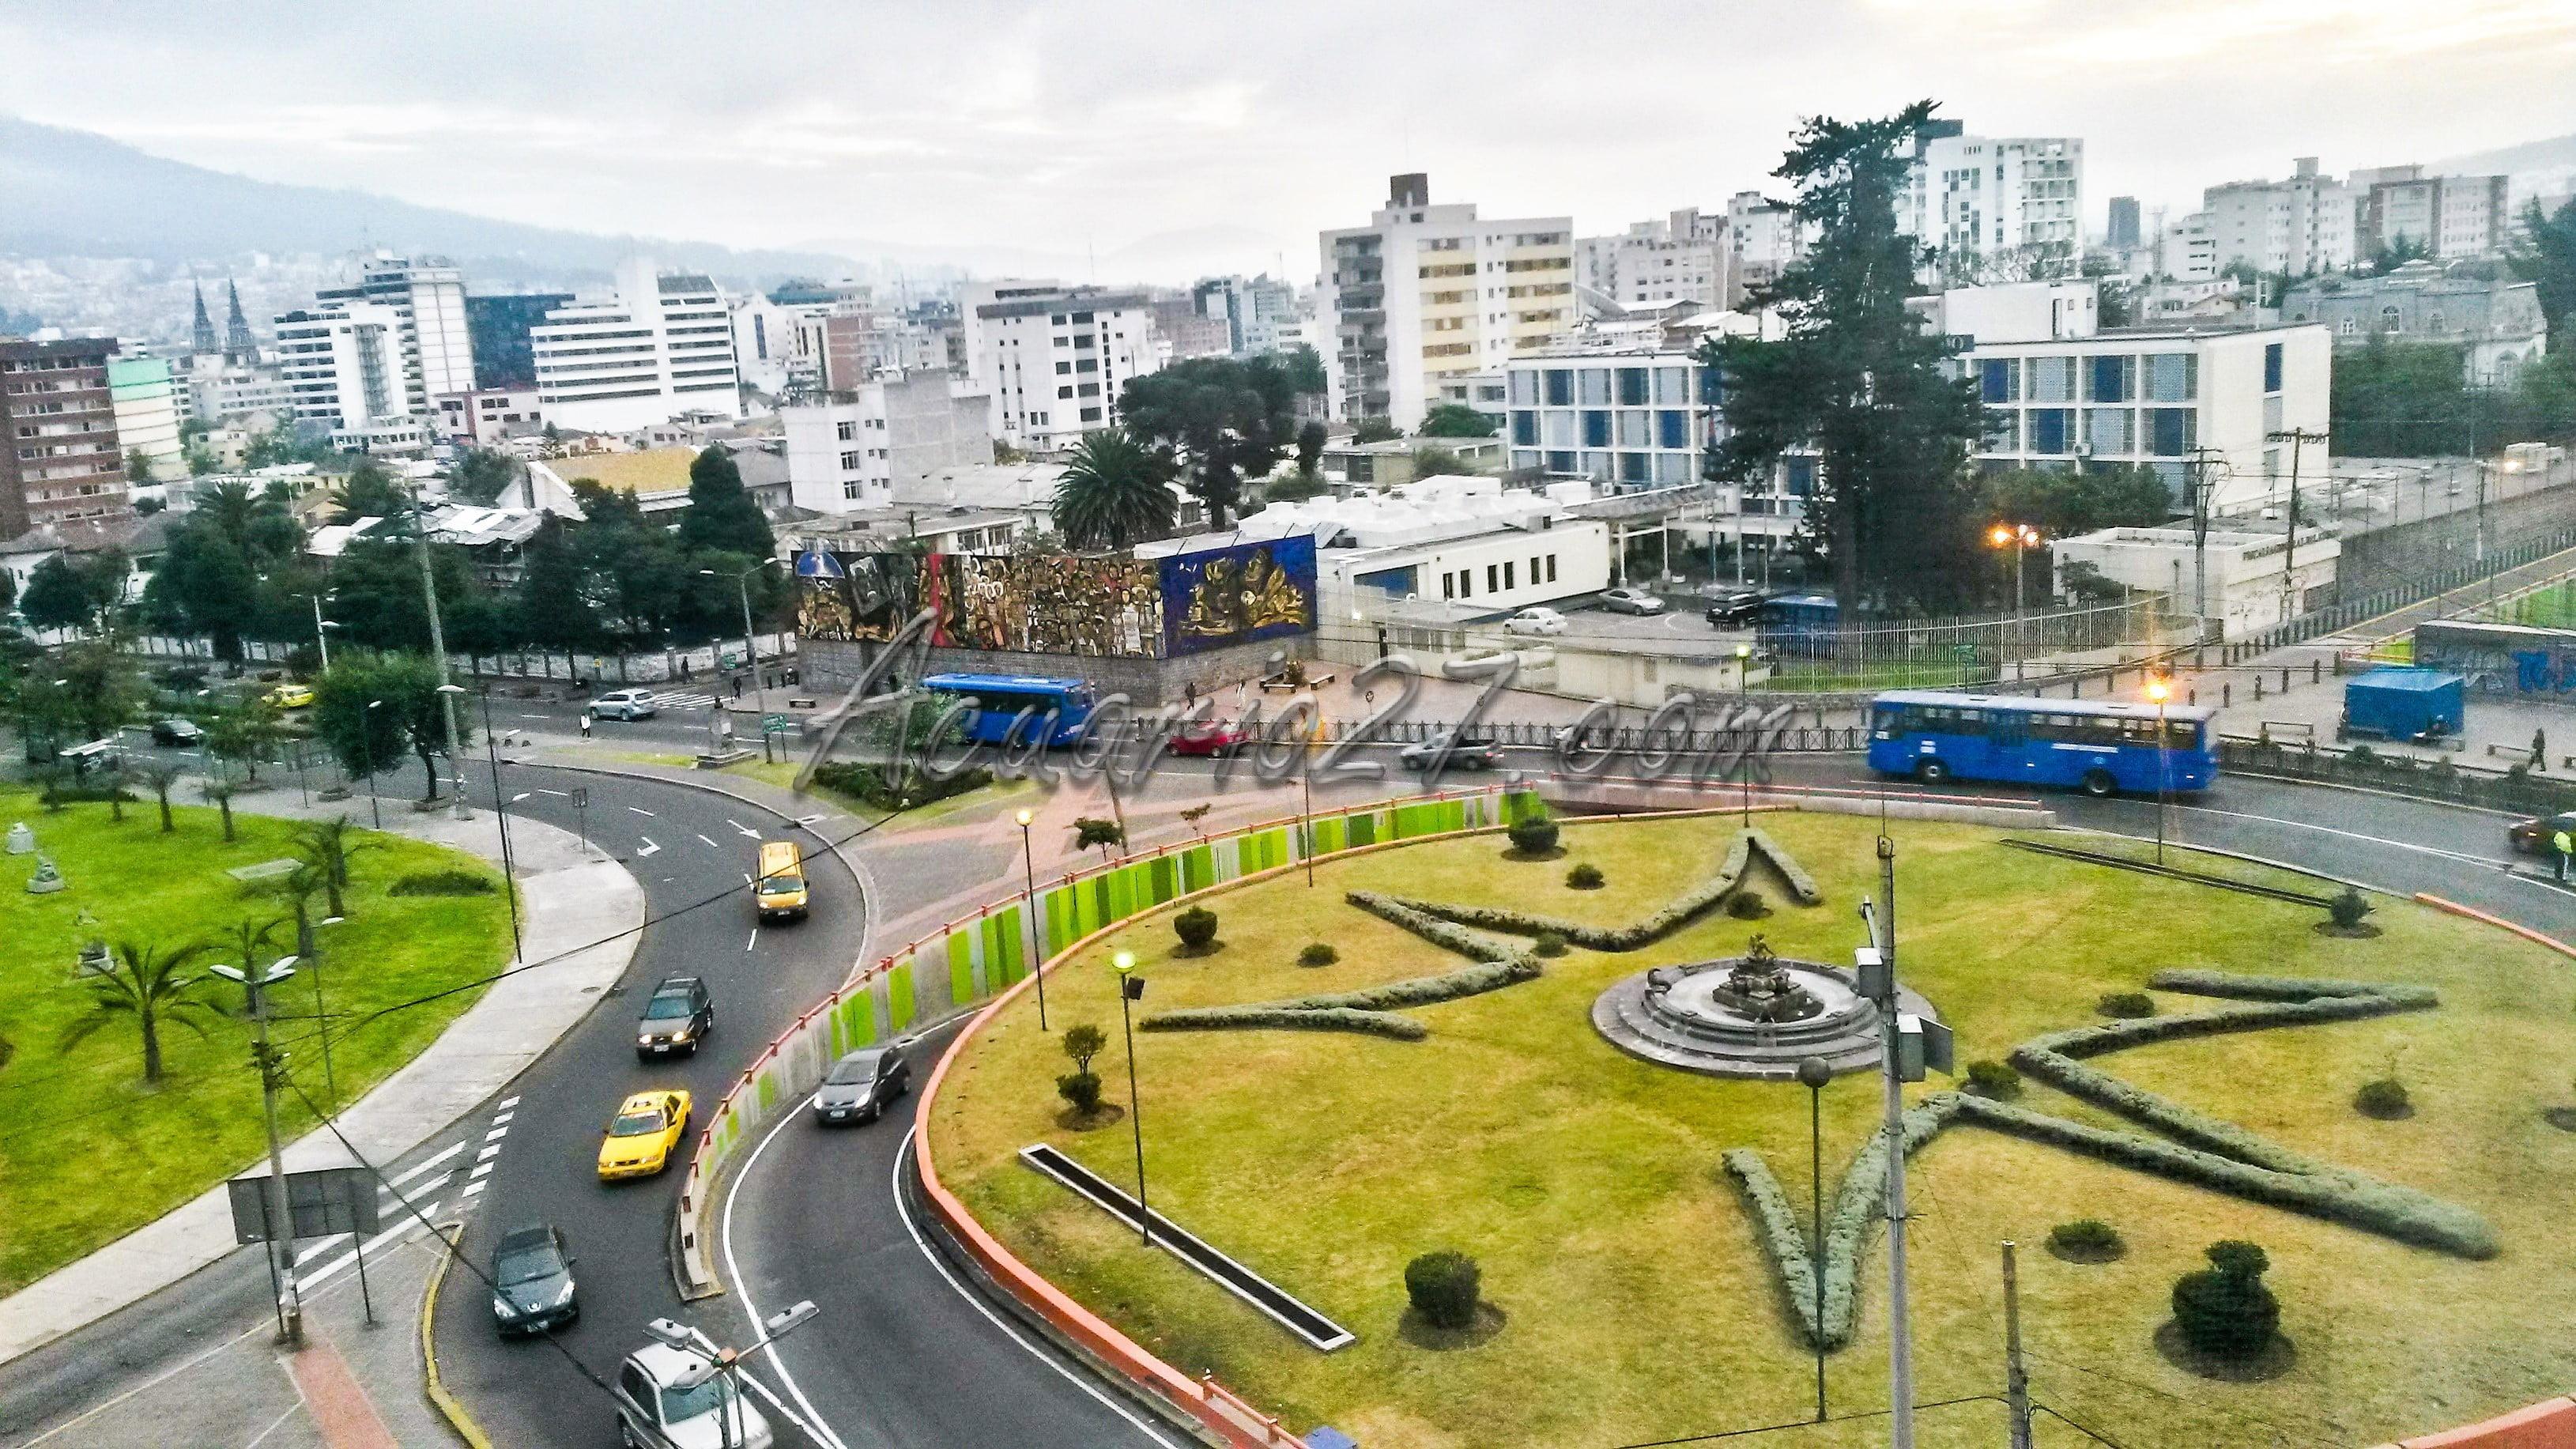 Redondel 12 de Octubre Quito